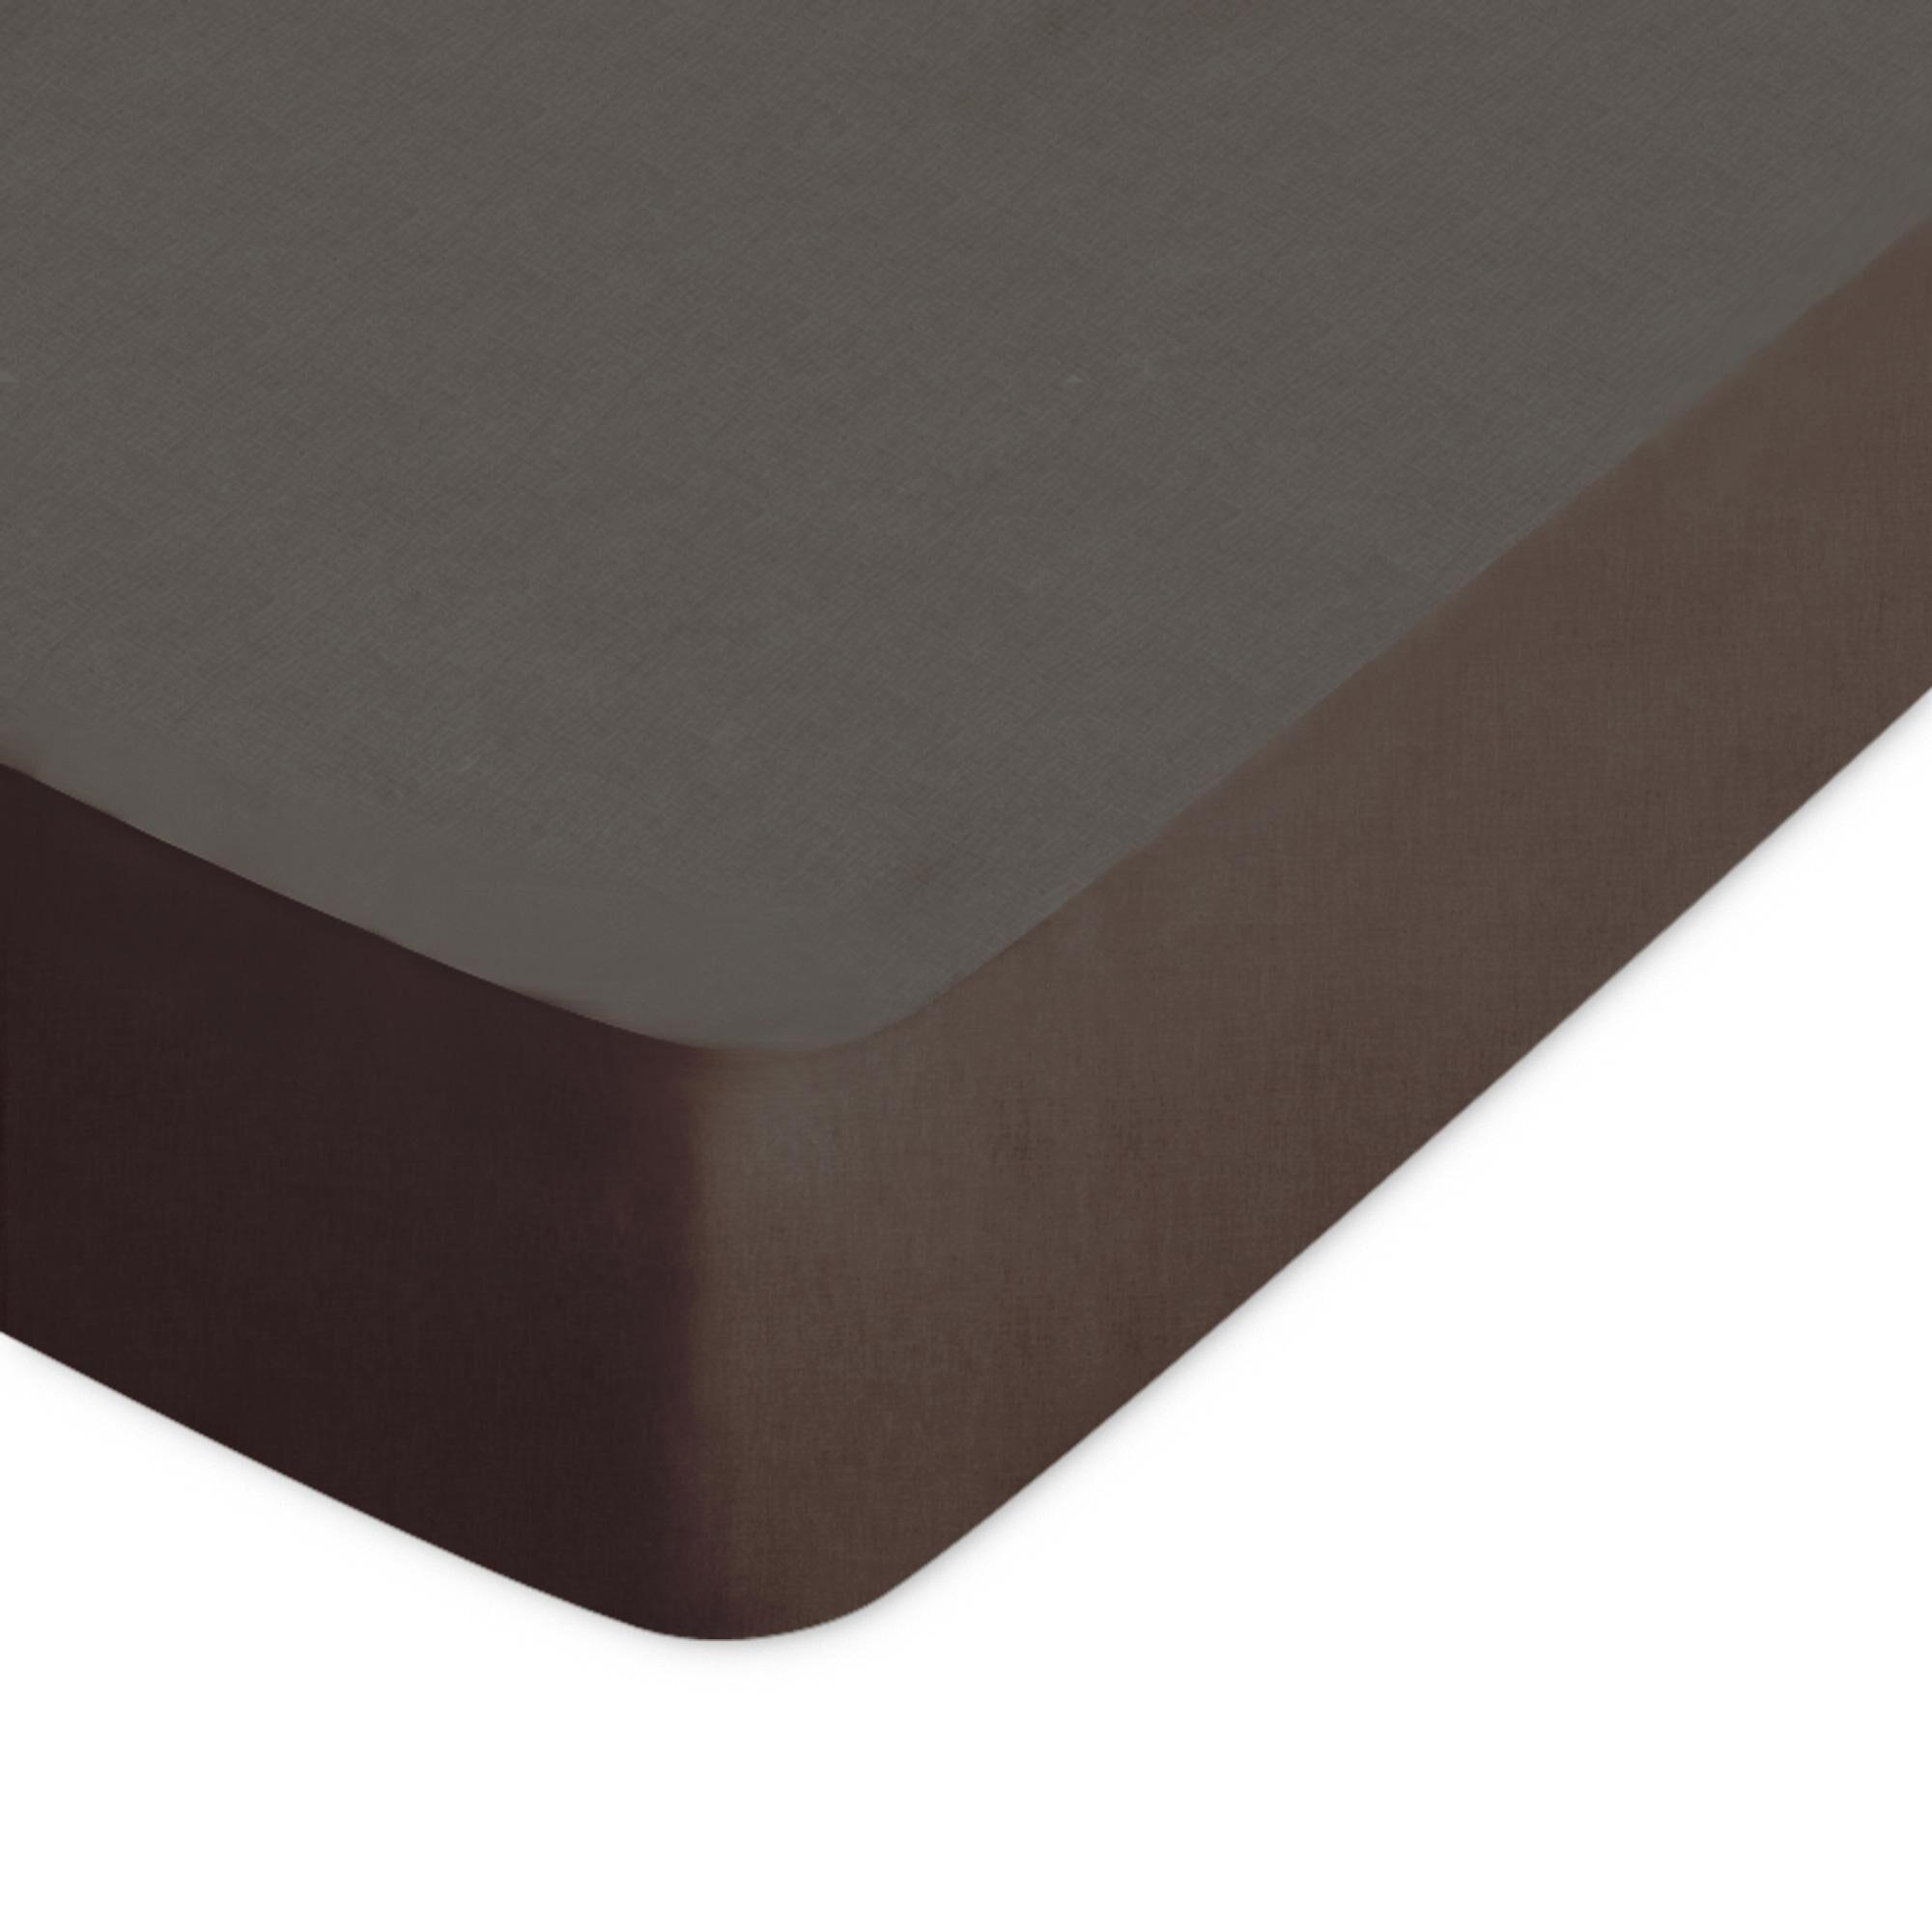 Linnea Drap housse uni 60x120 cm 100% coton ALTO Manganese